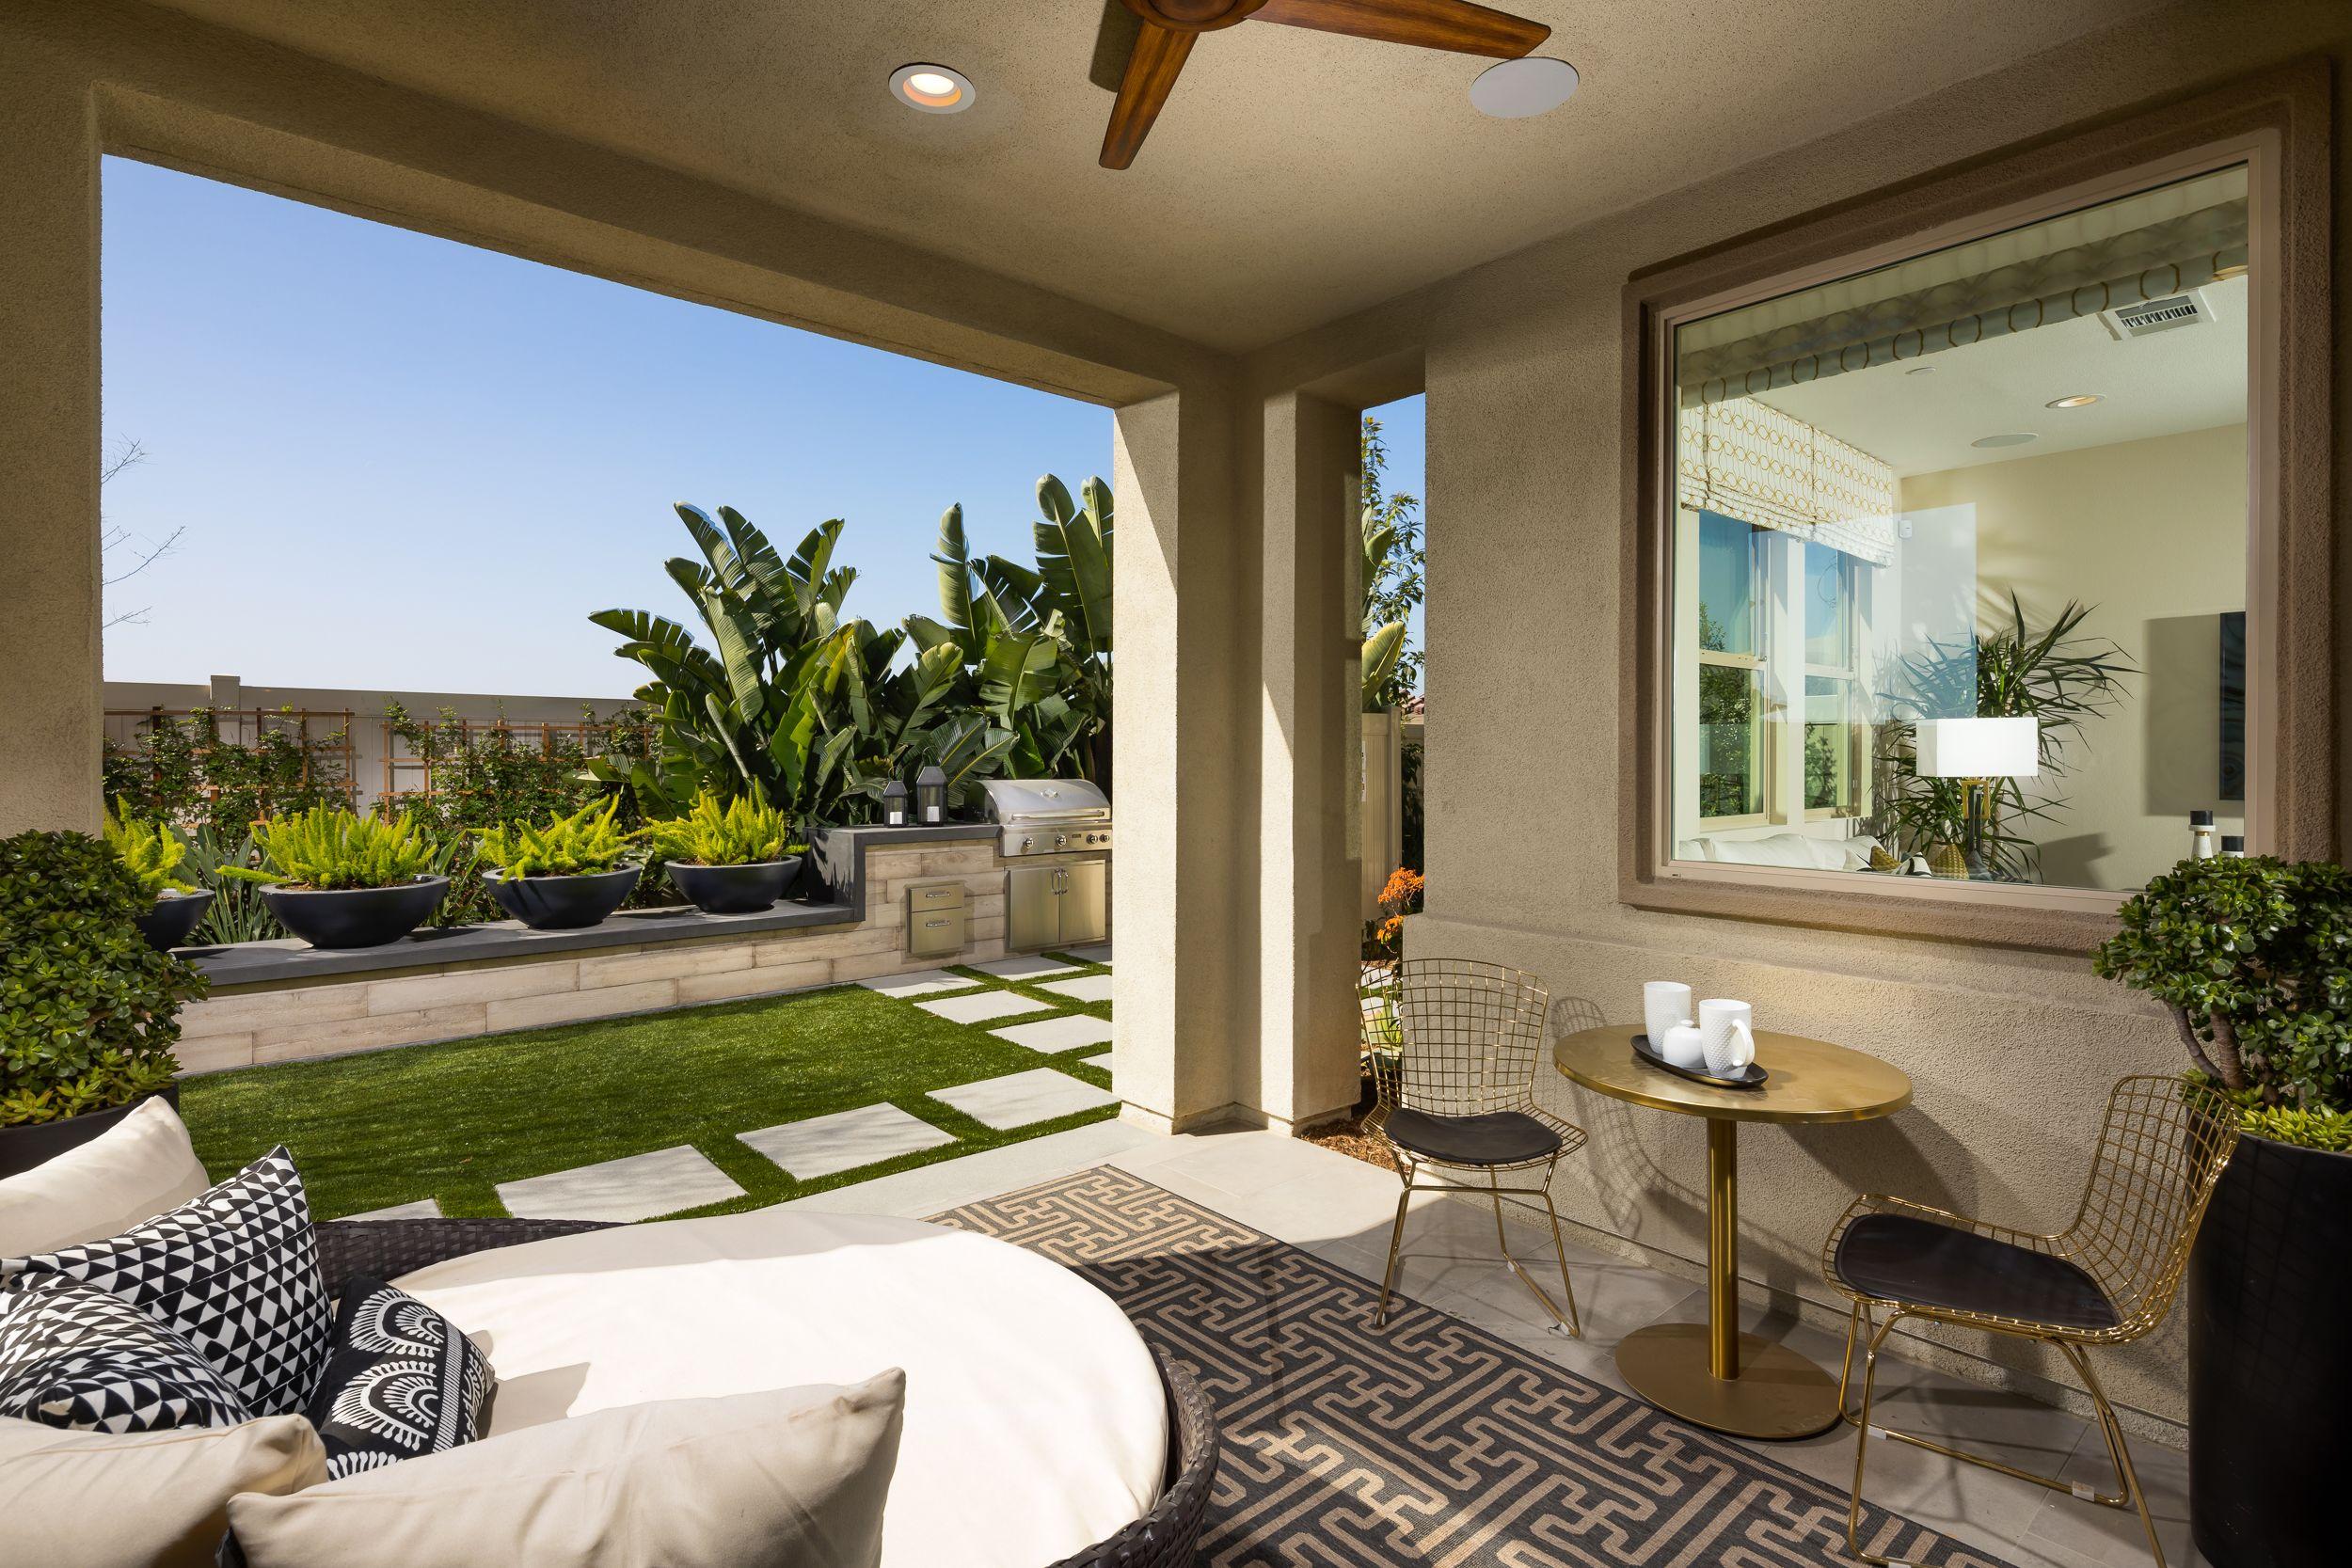 Strata at Escaya Best interior design, New house plans